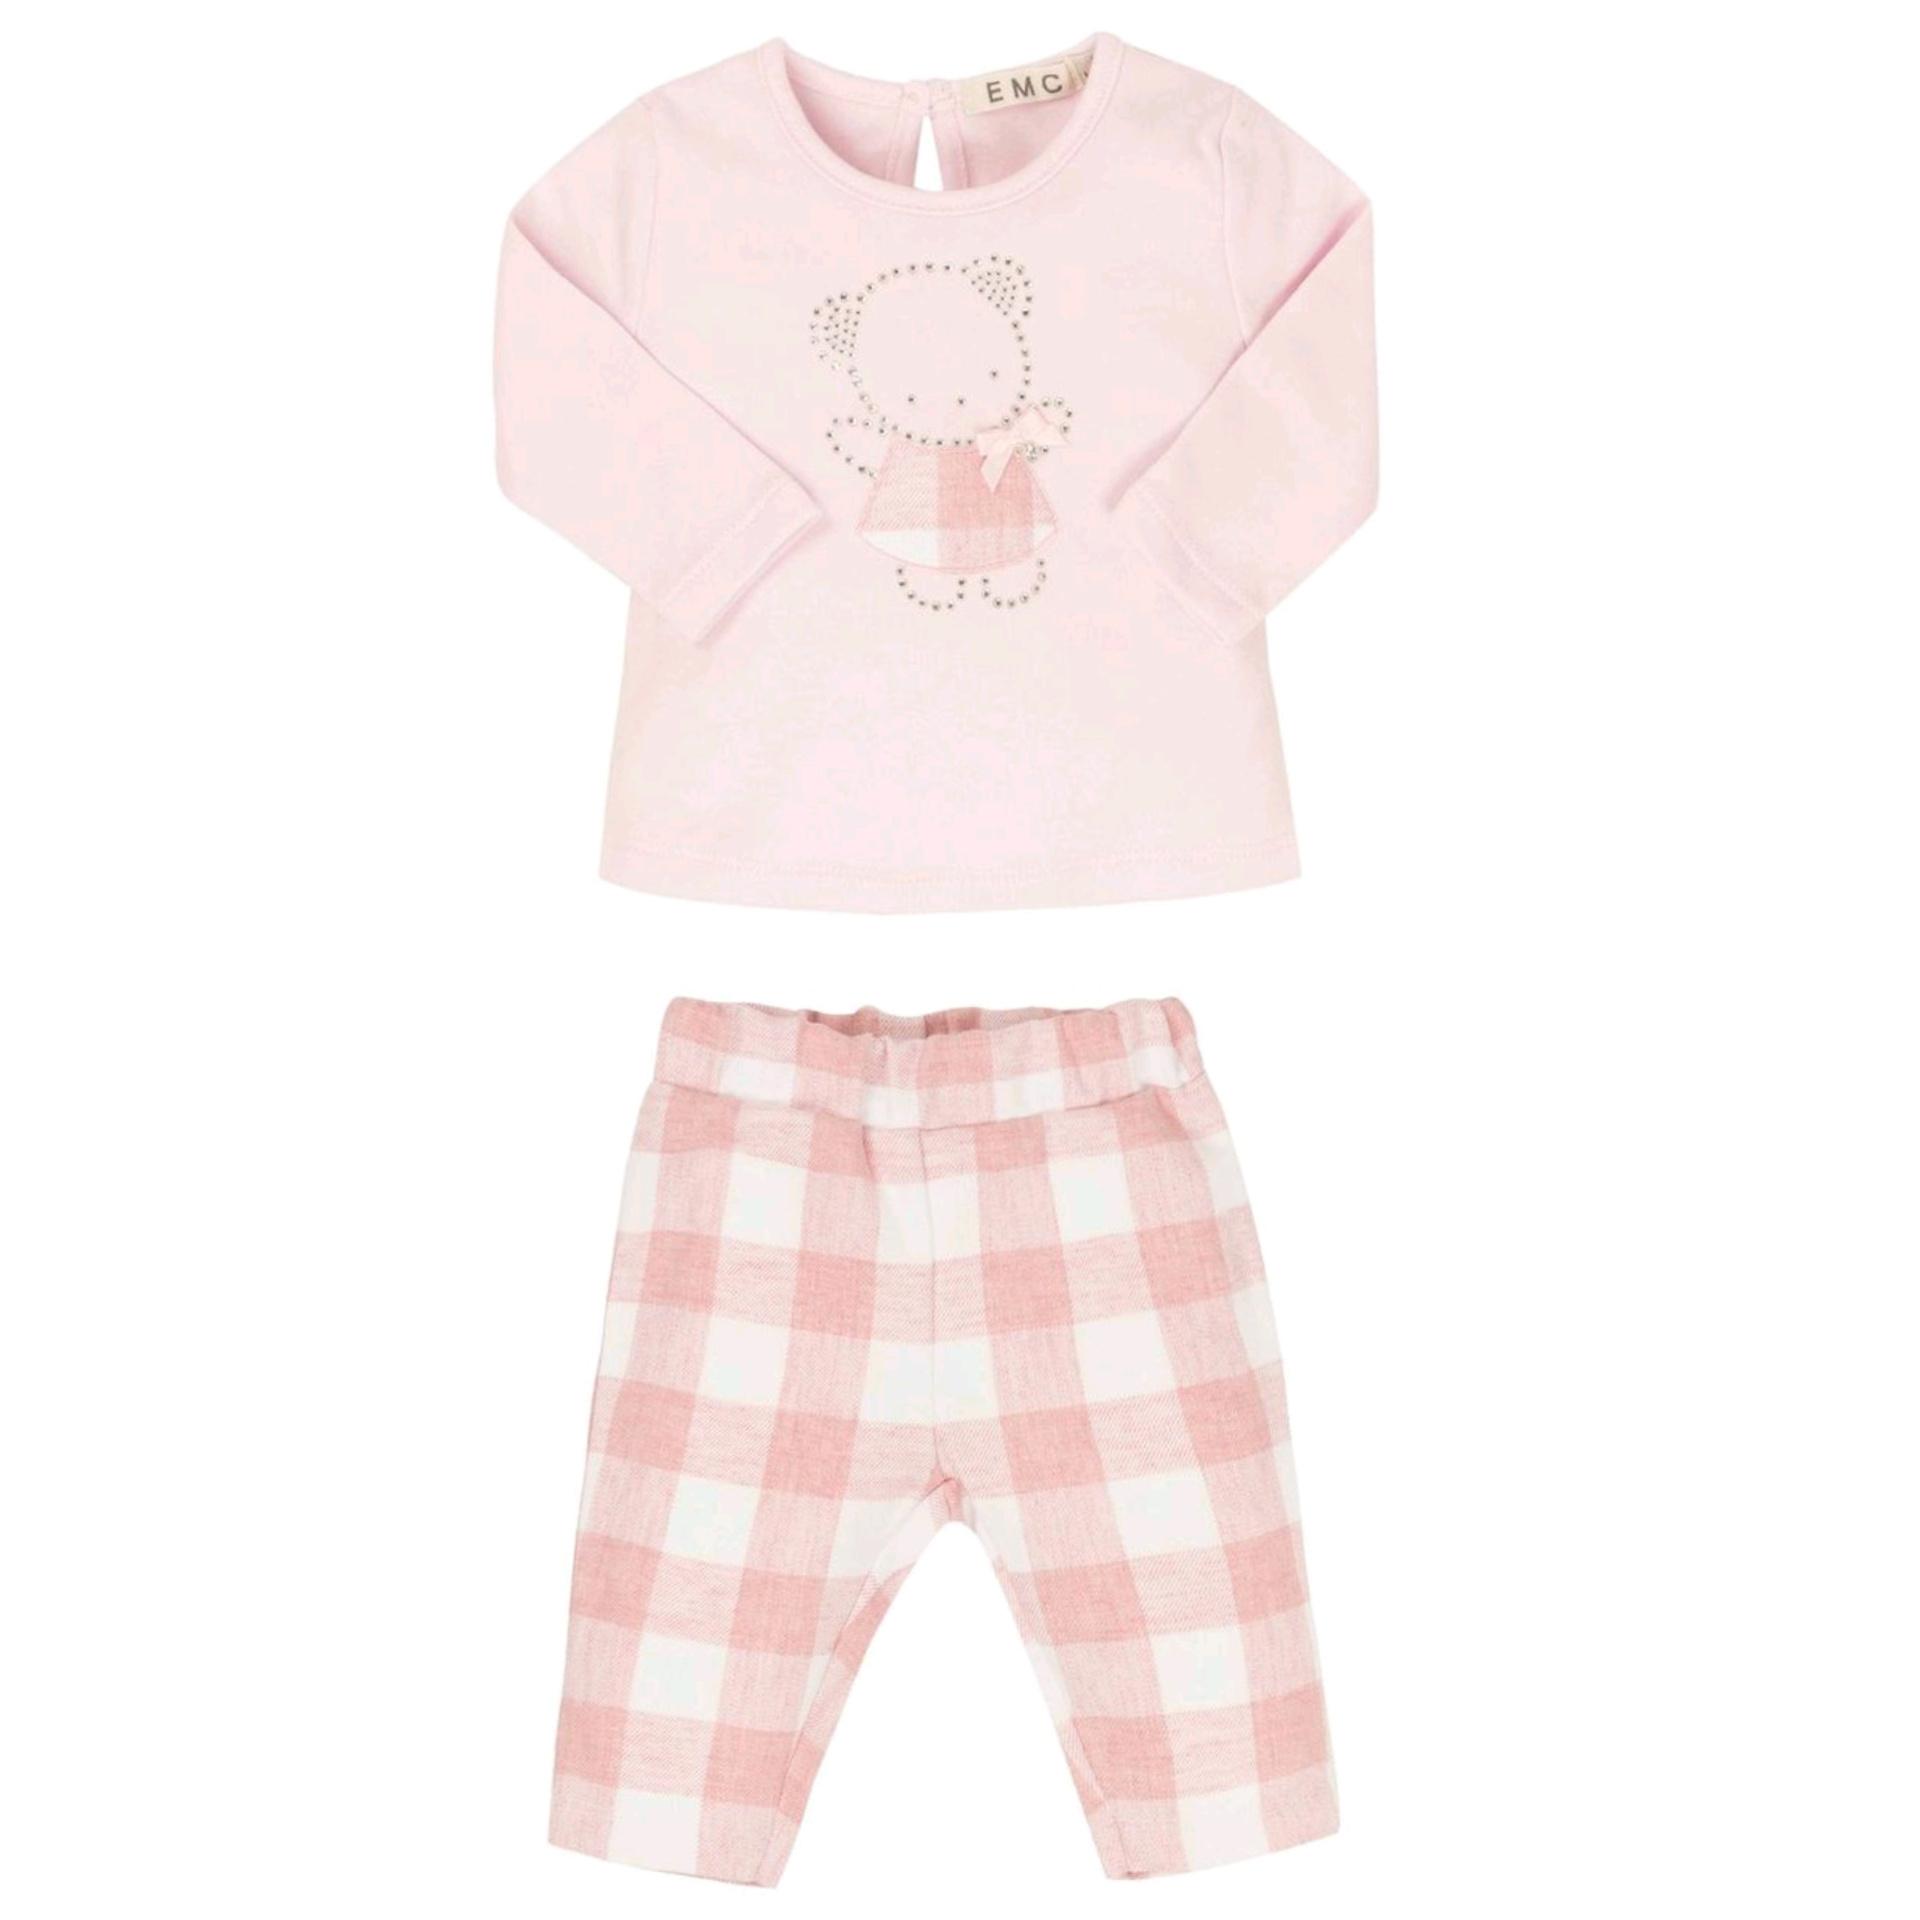 EMC EMC Pink Checked Trouser Set